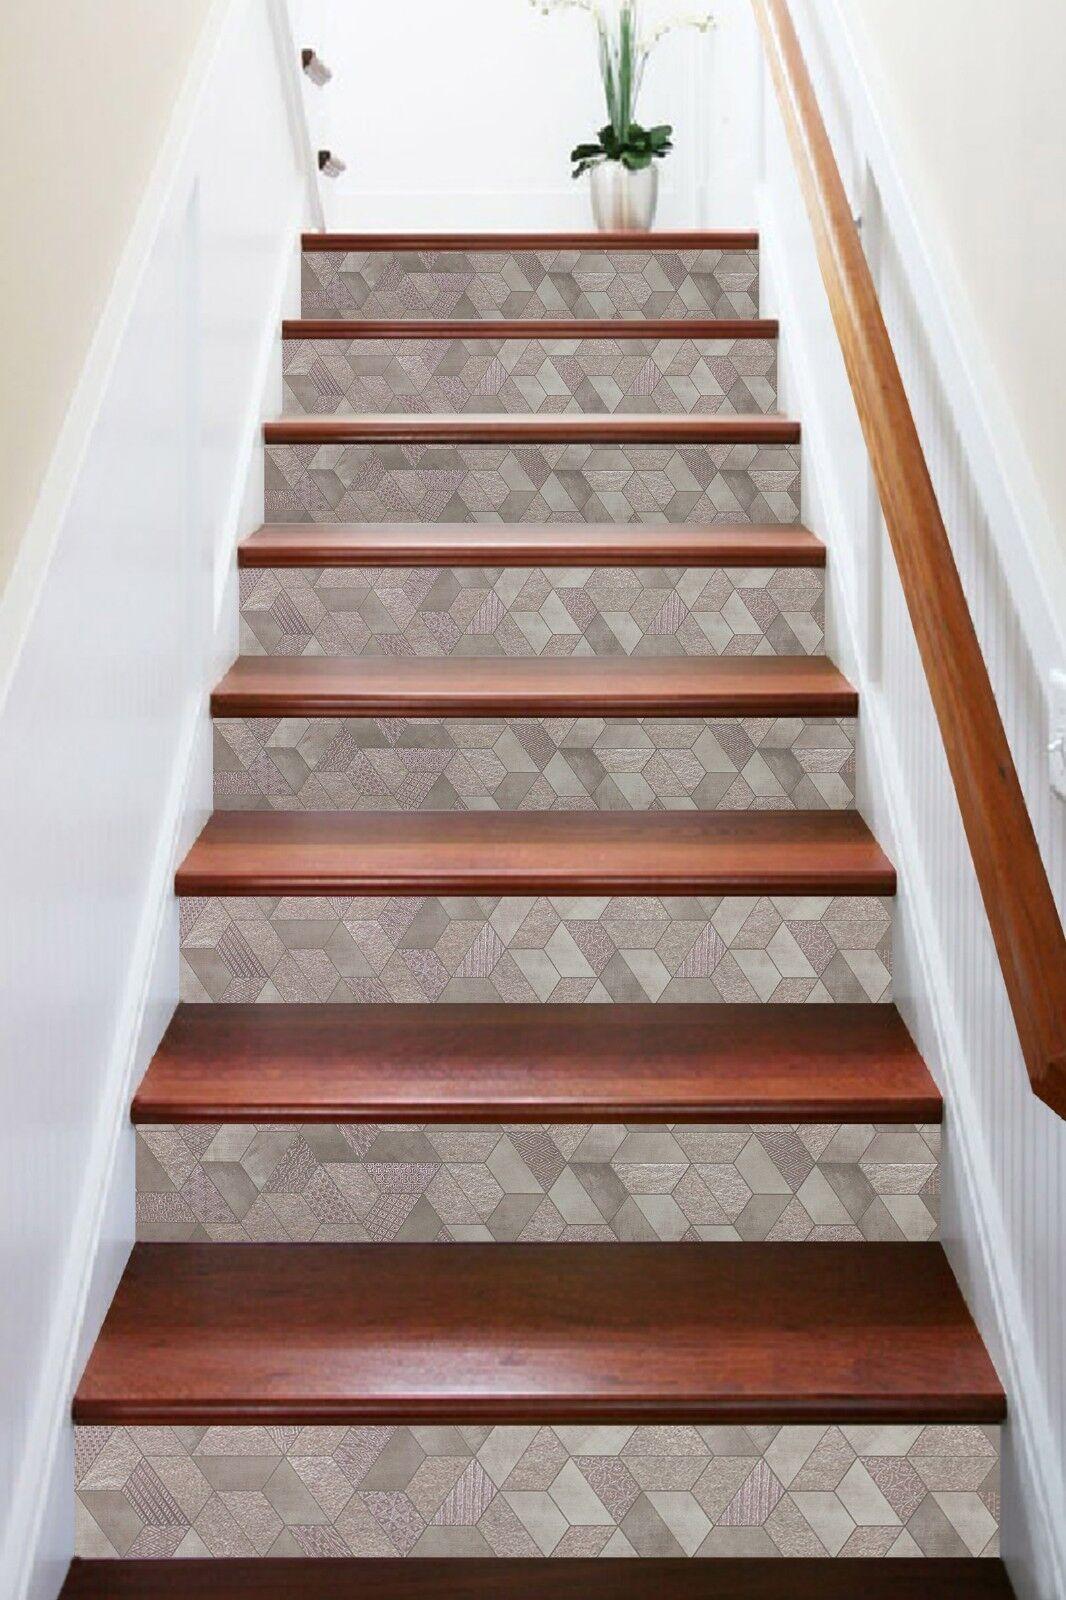 3D Hexagonal Patter 7 Tile Marble Stair Risers Photo Mural Vinyl Decal WandPapier